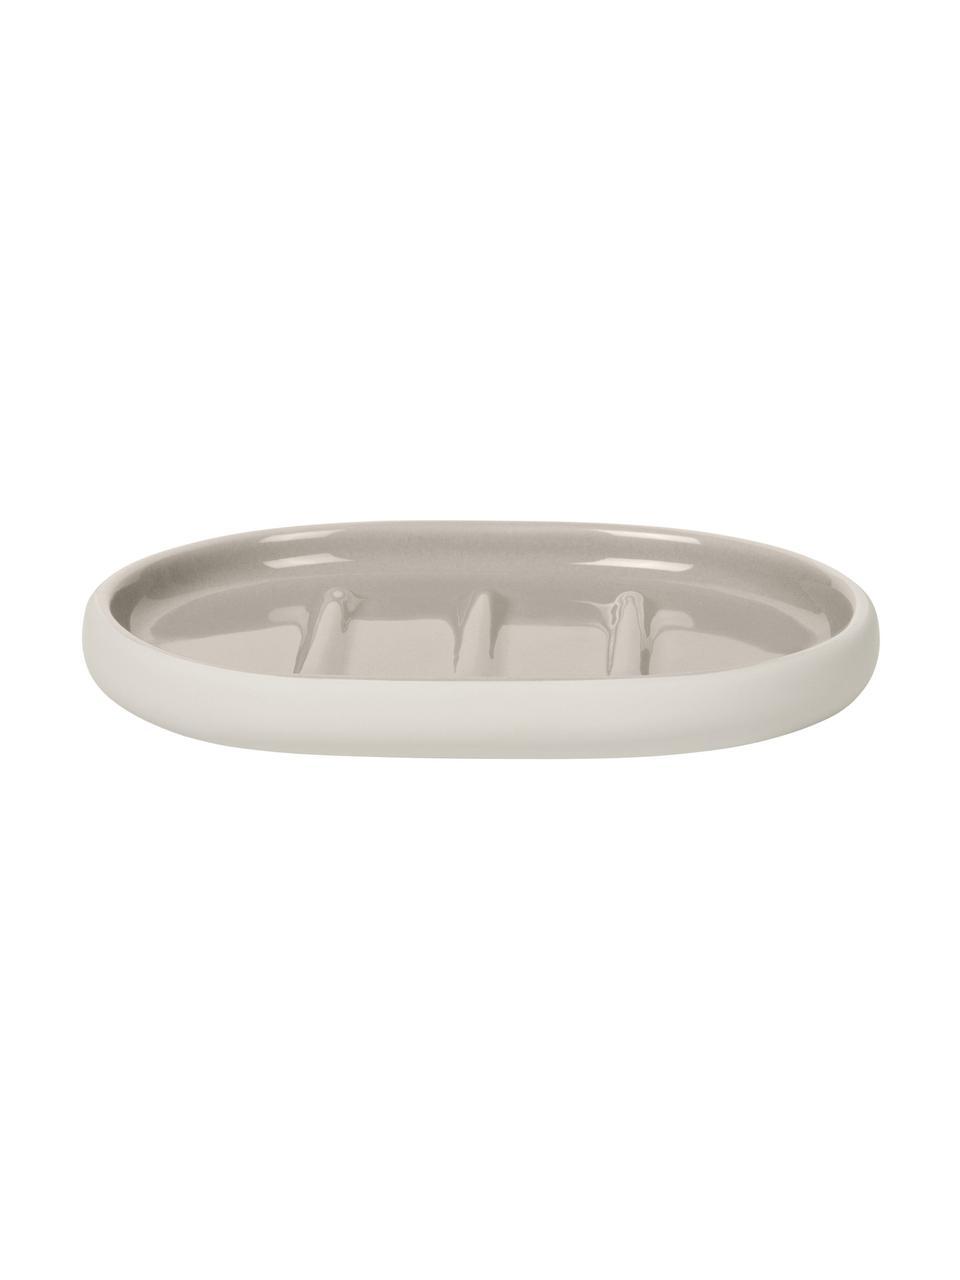 Seifenschale Sono aus Keramik, Keramik, Beige, 13 x 2 cm